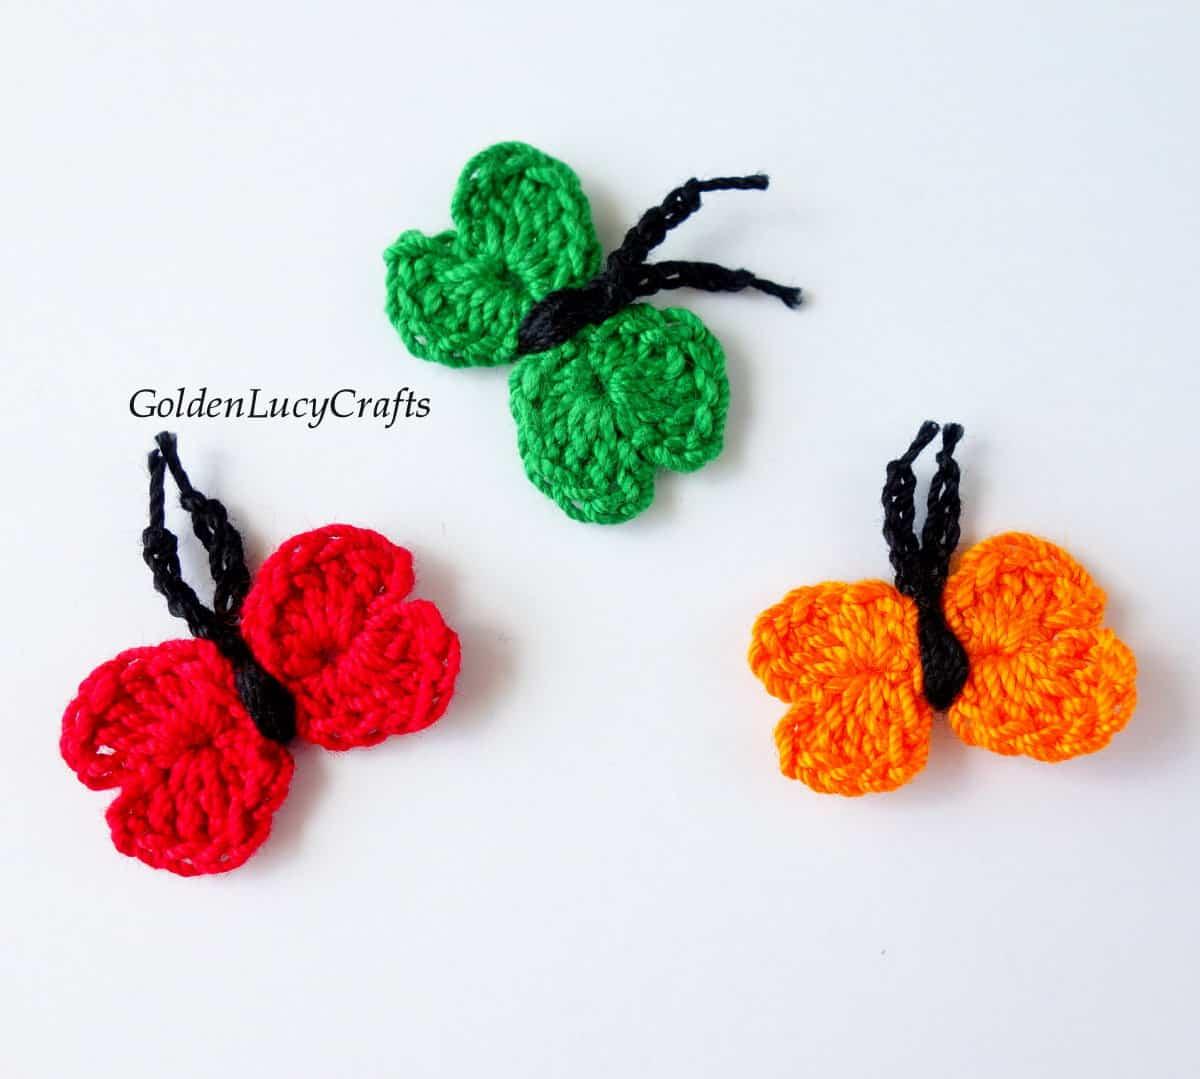 Three crochet butterflies in red, orange and green.